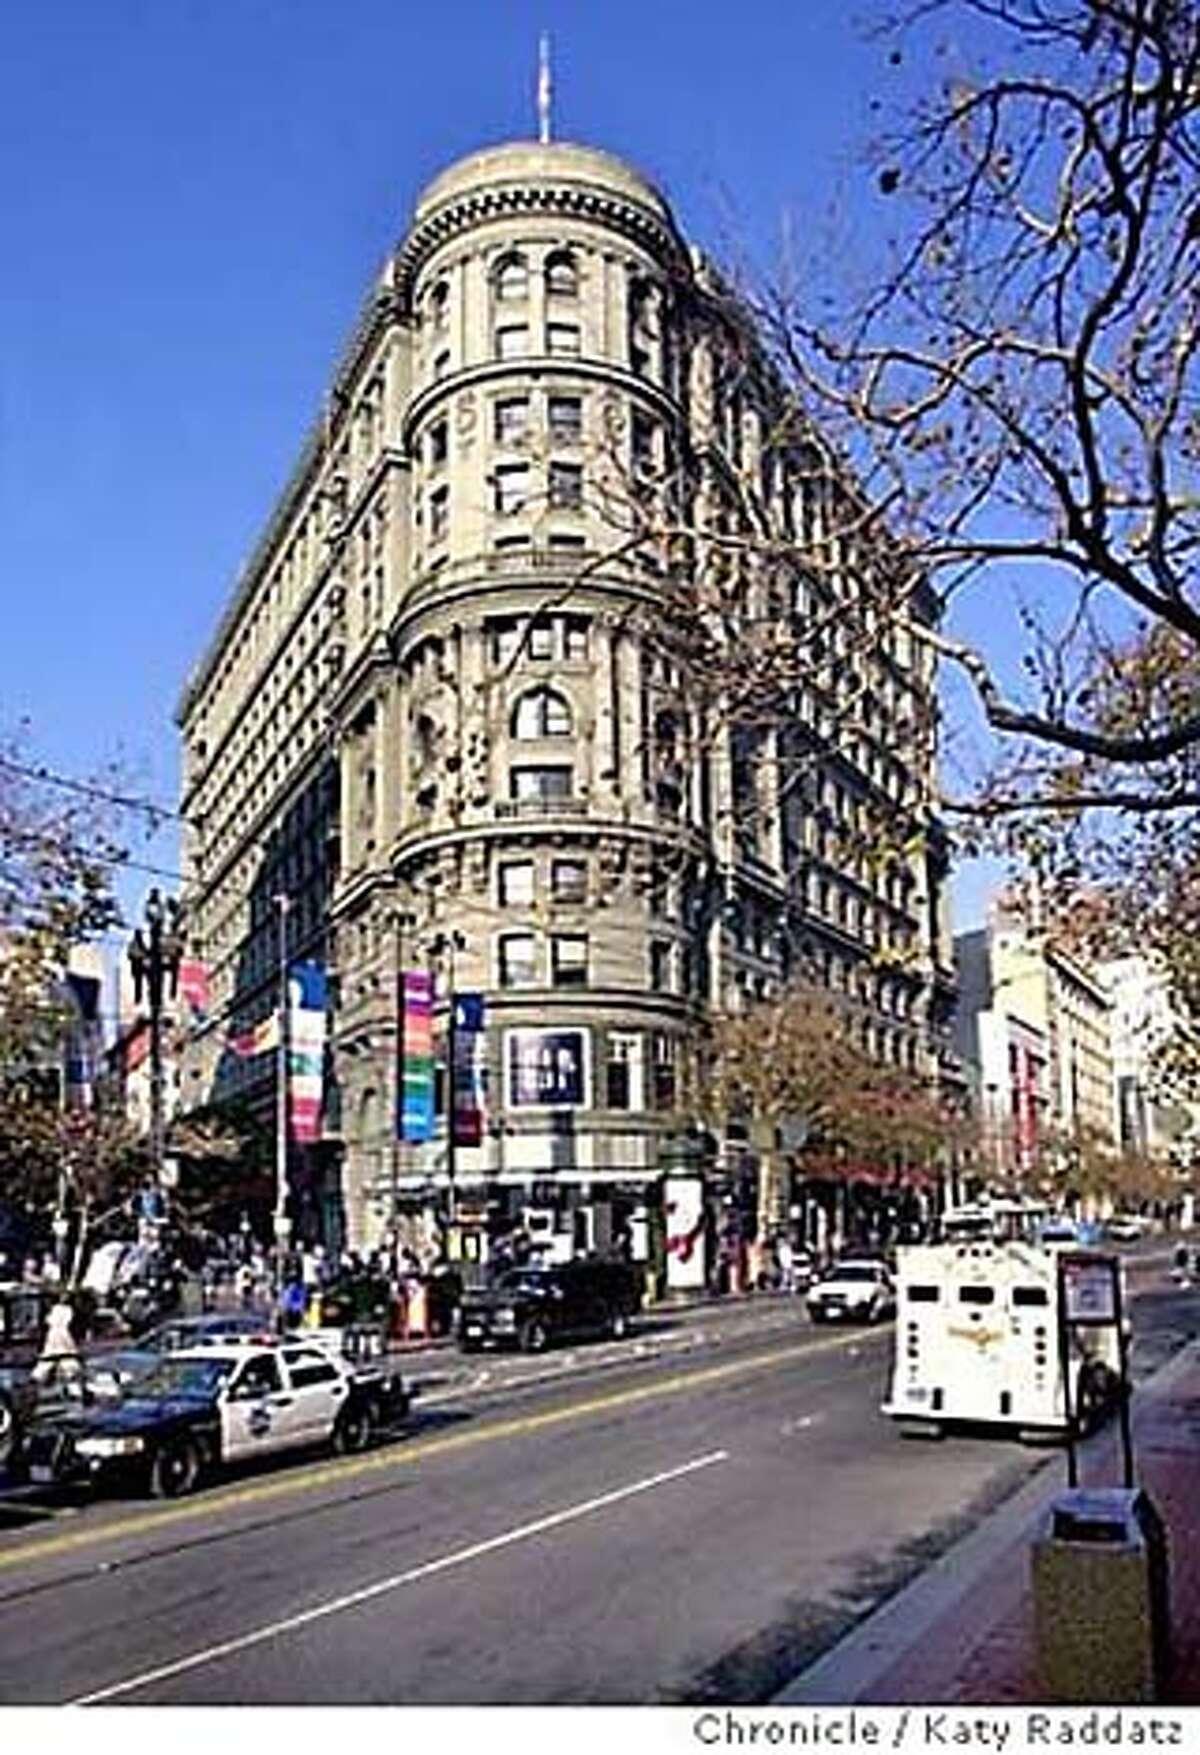 Photos of The Flood Building in San Francisco. Datebook#Datebook#SundayDateBook#10-31-2004#ALL#Advance##0422421247